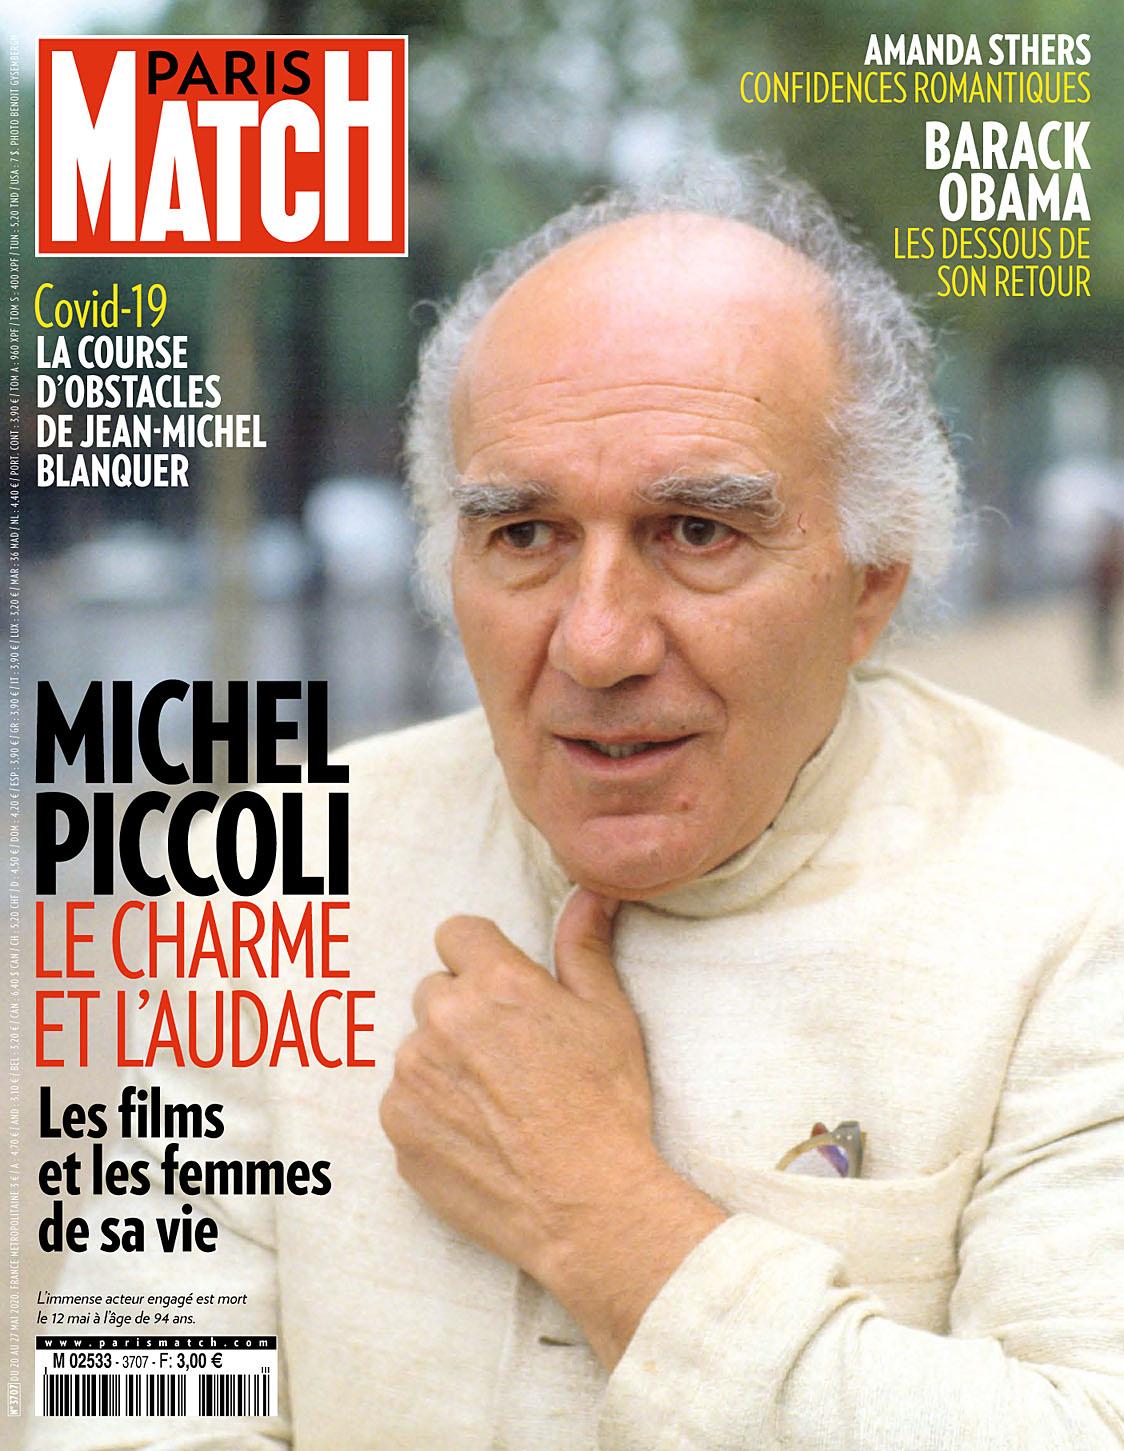 Paris Match 20-05-20.jpg